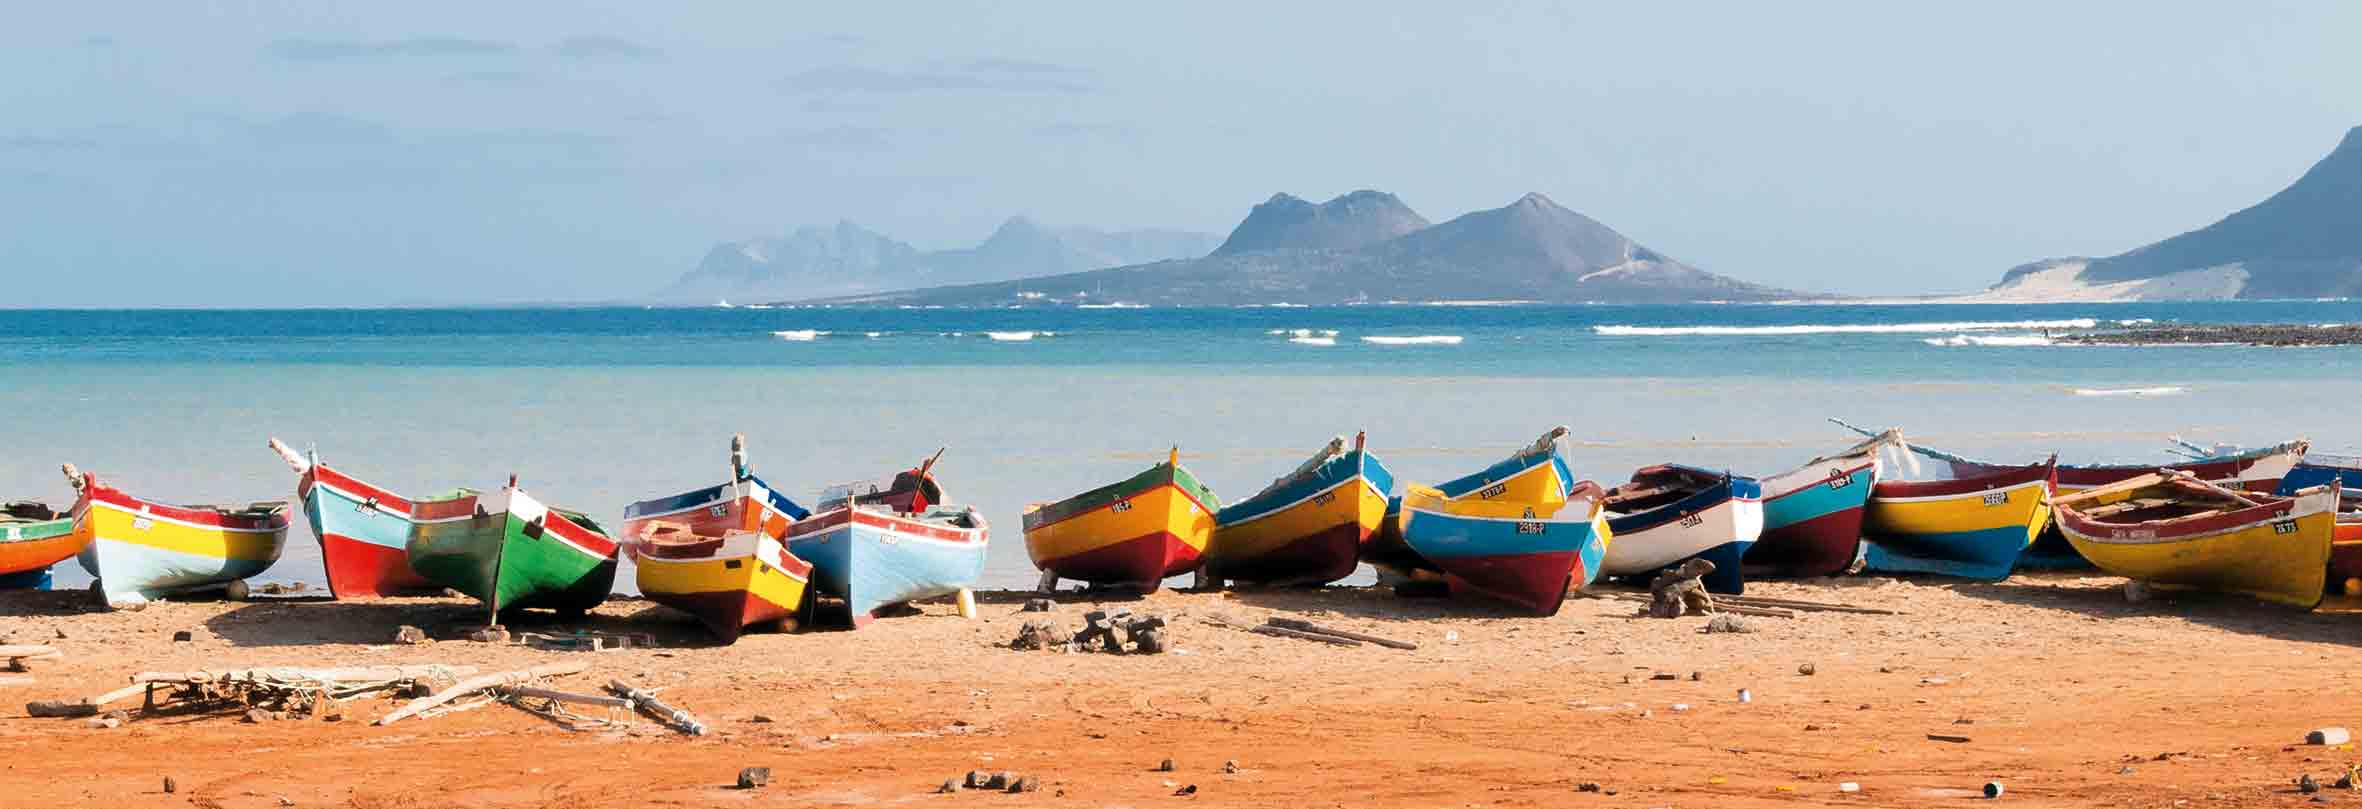 Bunte Schiffe, Cabo Verde